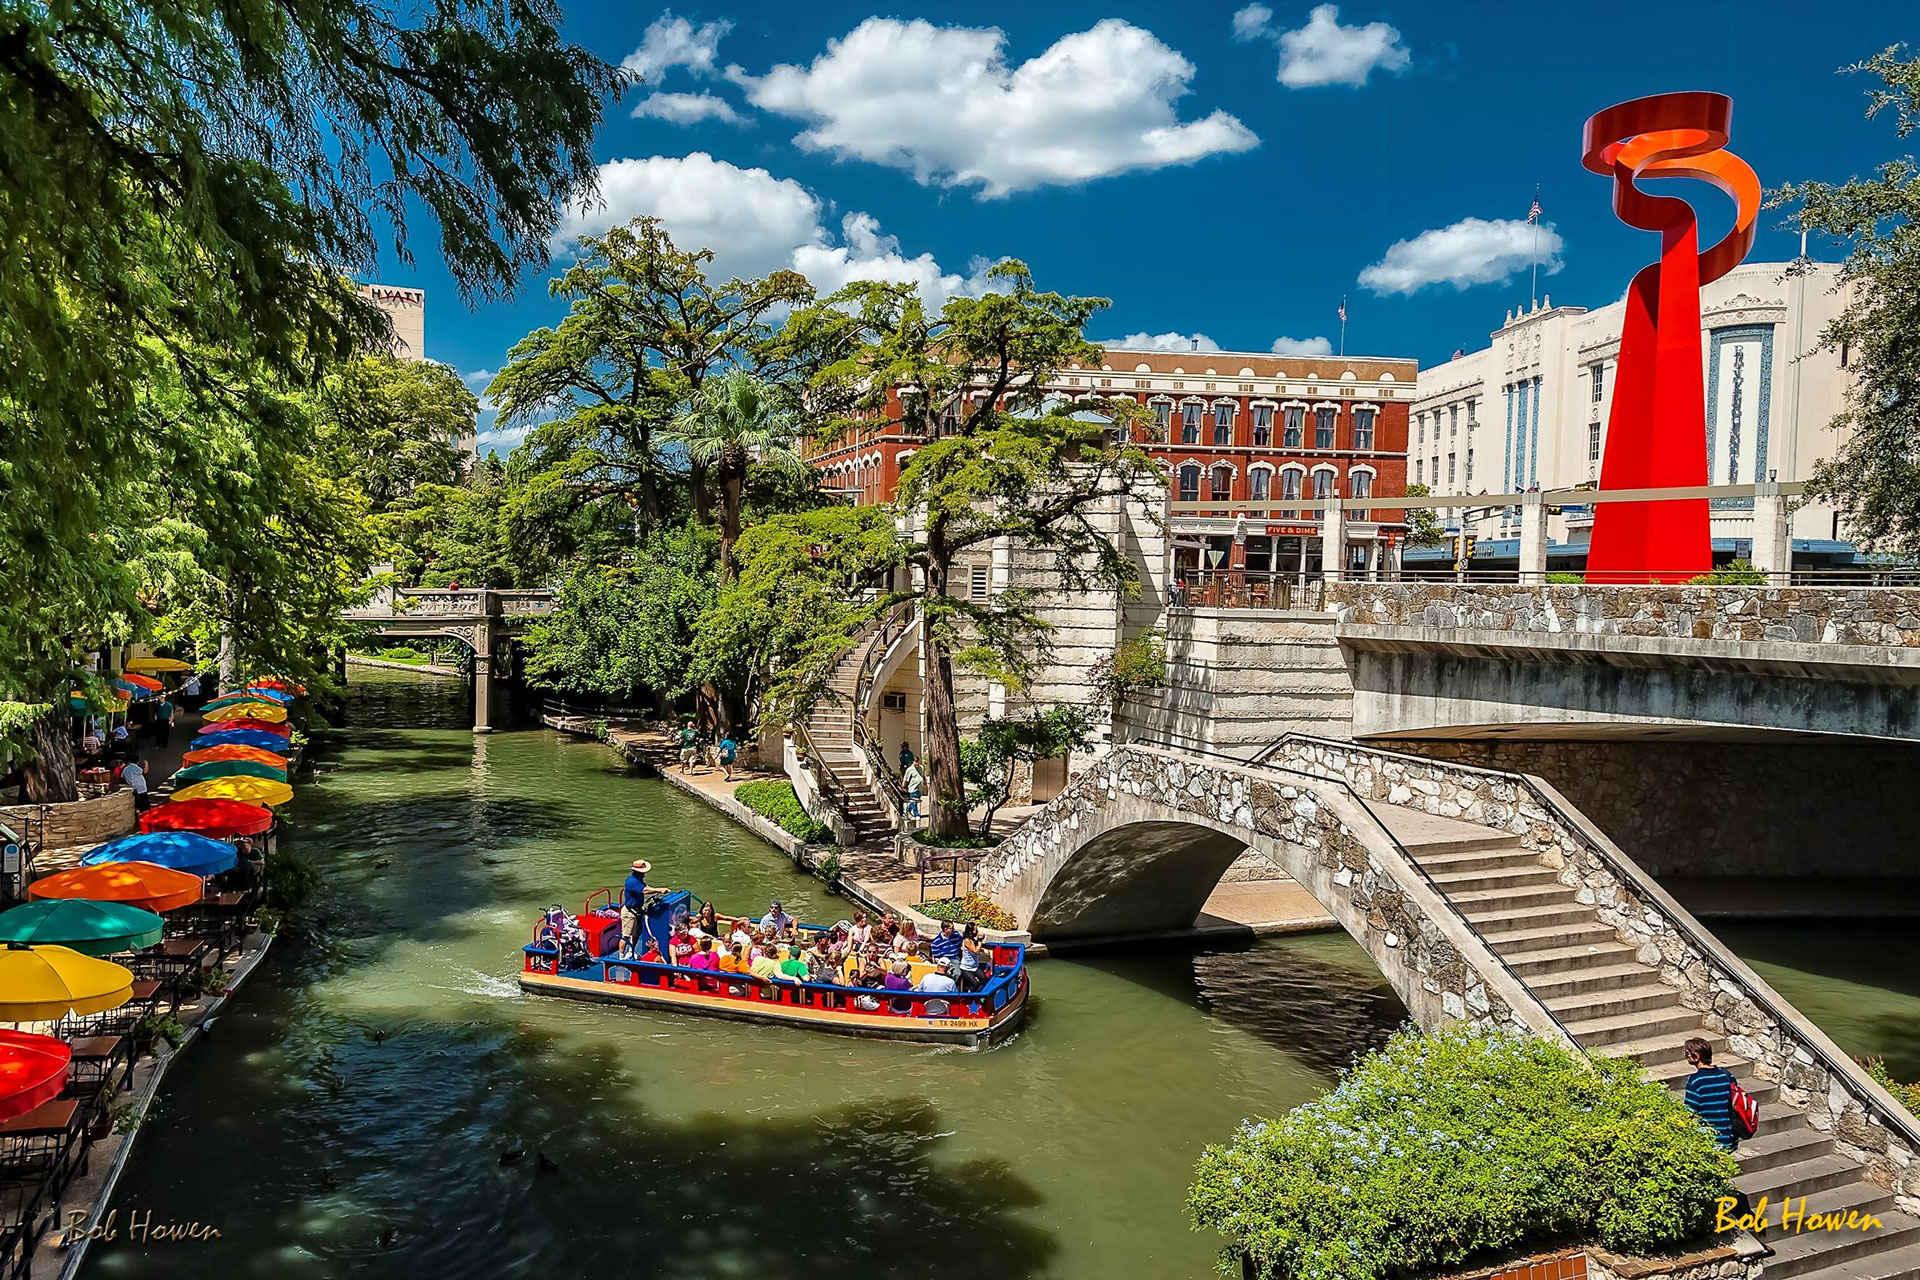 San Antonio Weekend Getaways for Families  Family